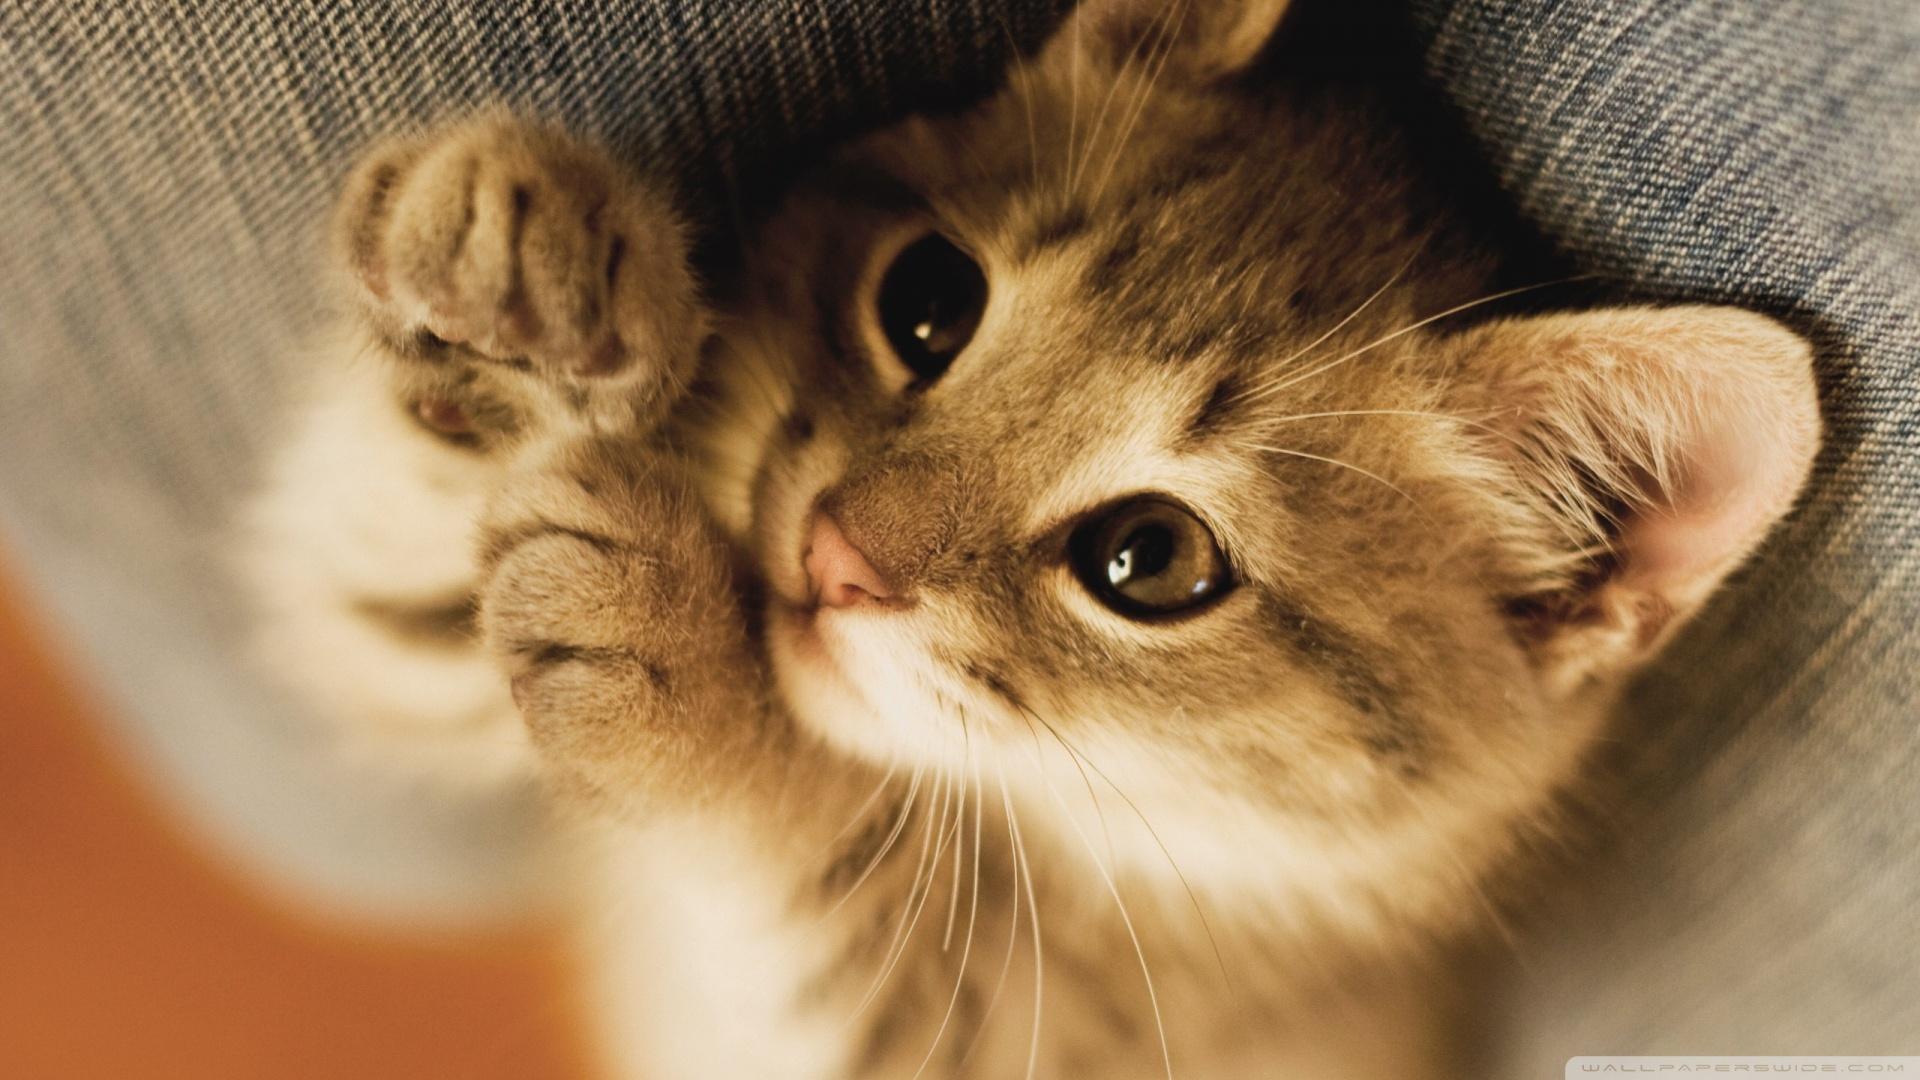 Cute kitten backgrounds sf wallpaper cute kitten backgrounds page 1 thecheapjerseys Images